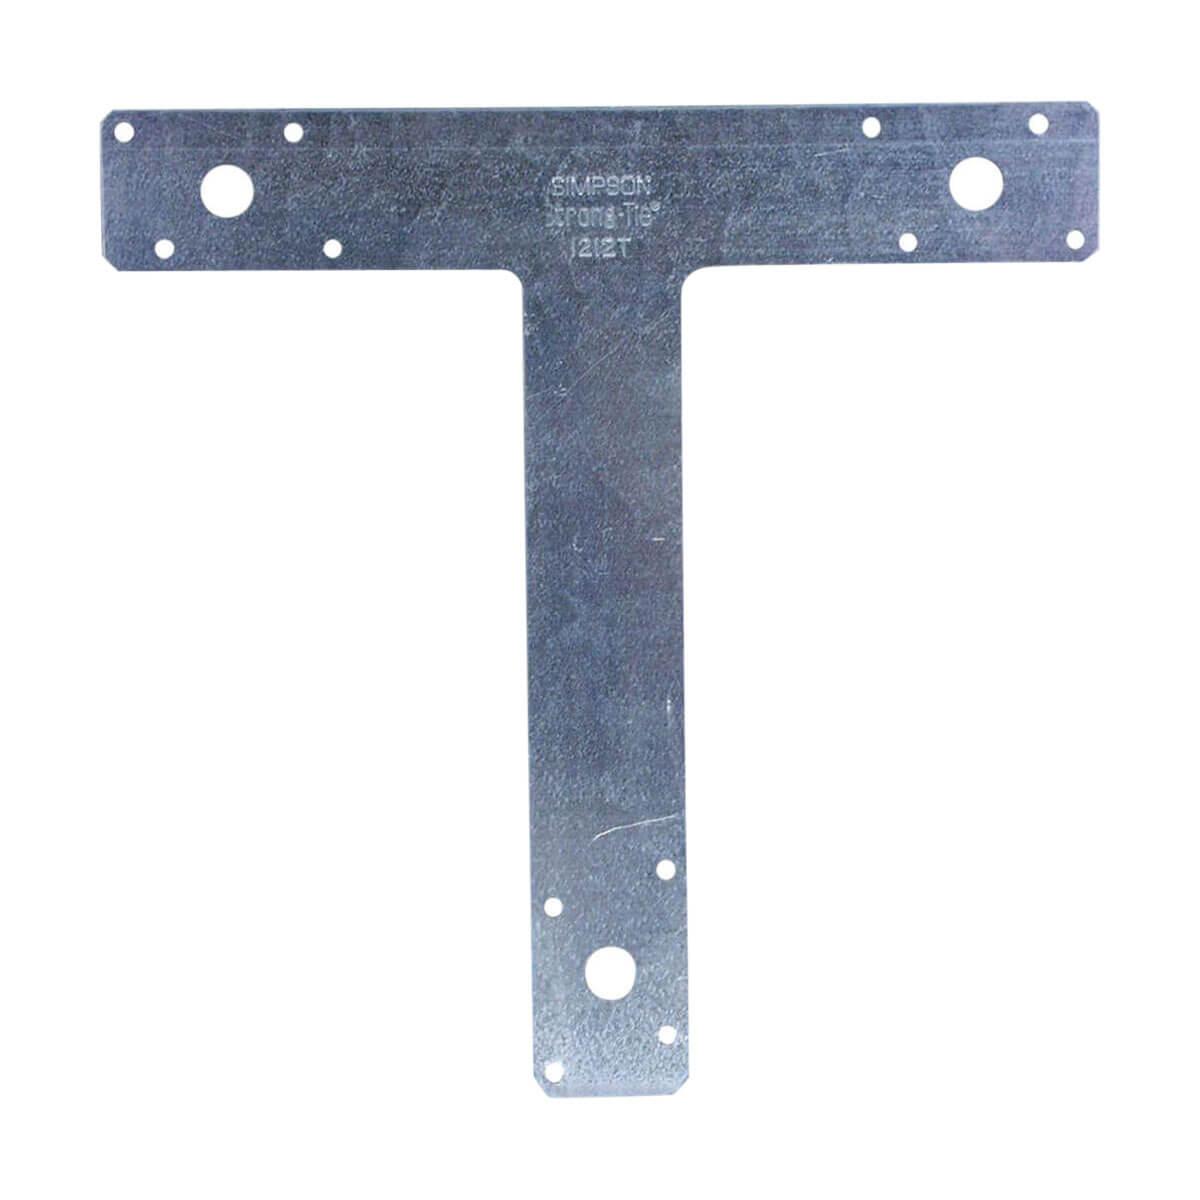 T Strap - 14 Gauge - 12-in x 8-in